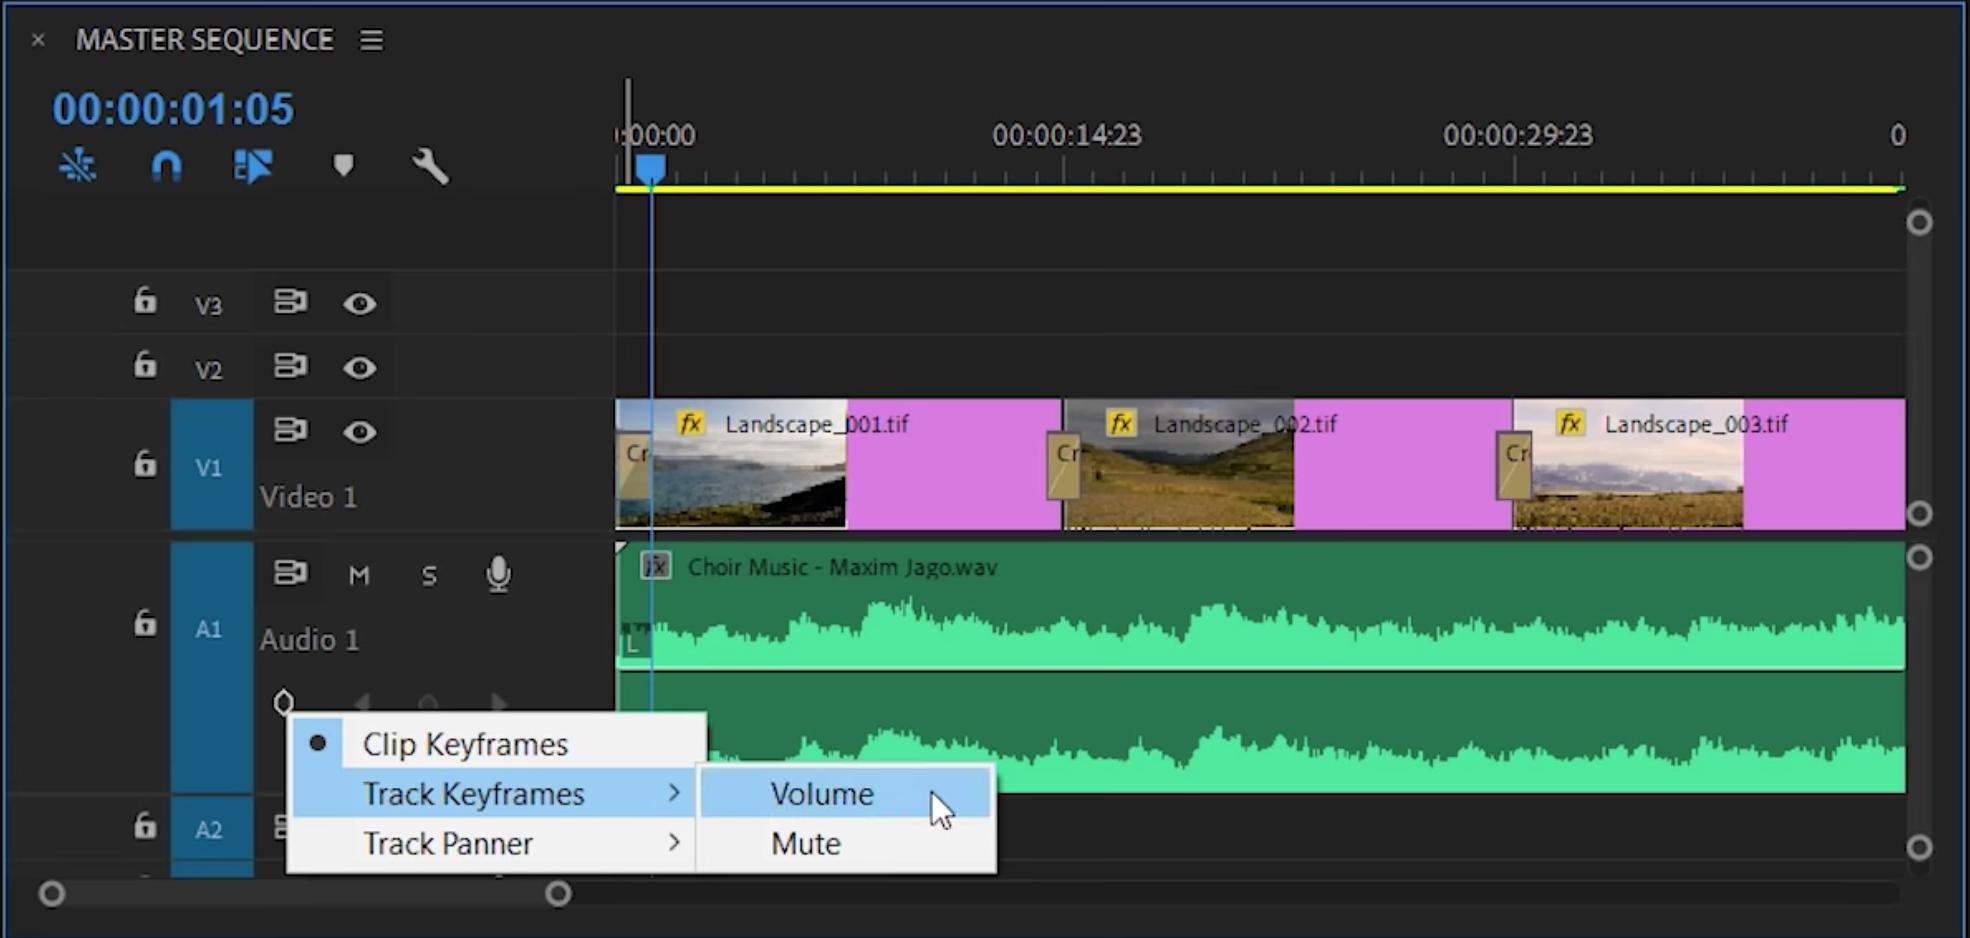 audio-track-keyframes-volume-premiere-pro.png